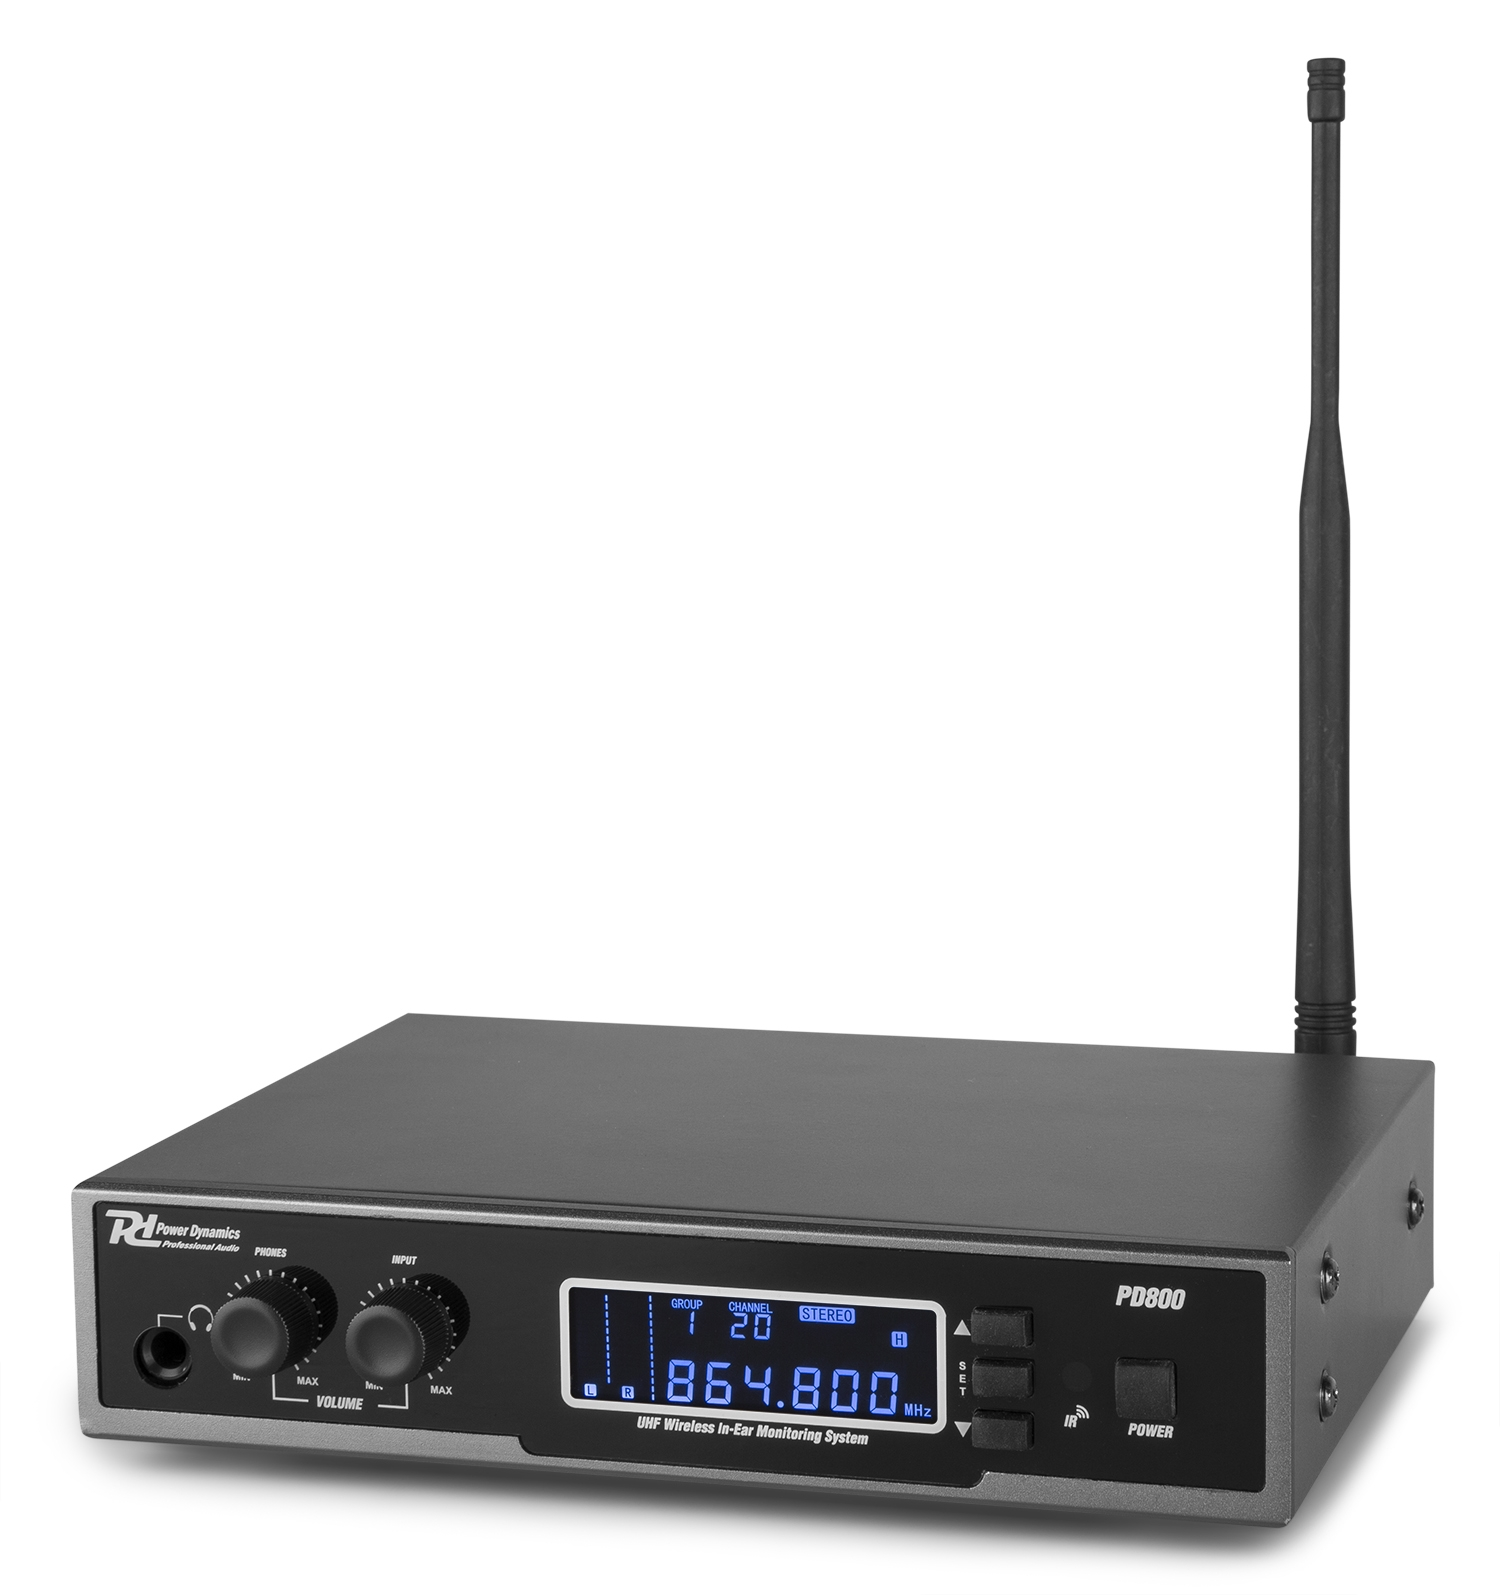 Power Dynamics PD800 In Ear monitorovací systém UHF